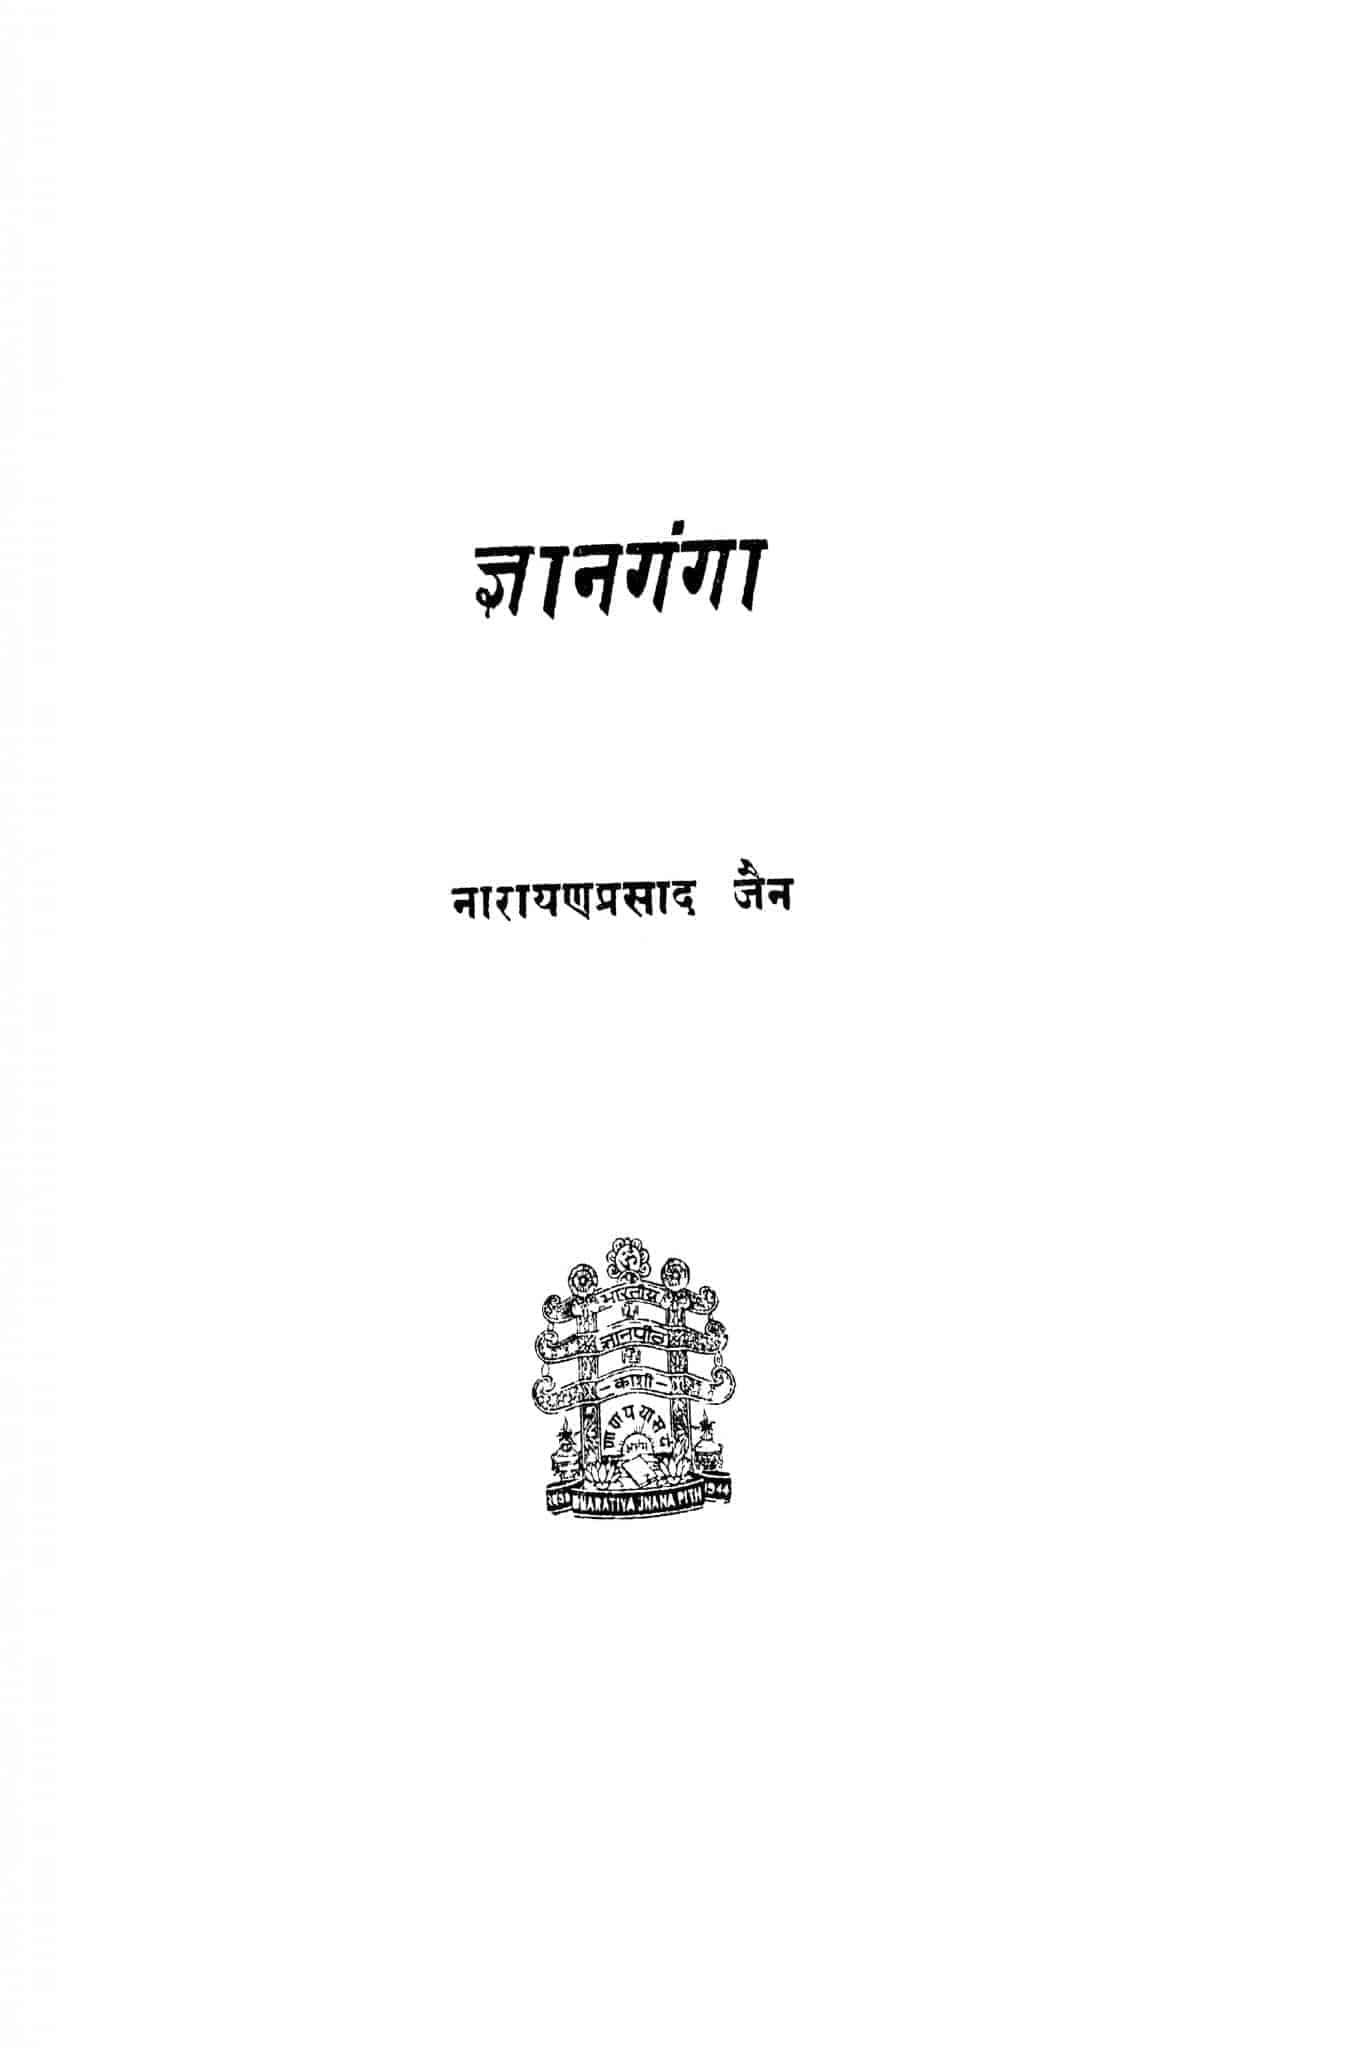 Book Image : ज्ञानगंगा - Gyanganga